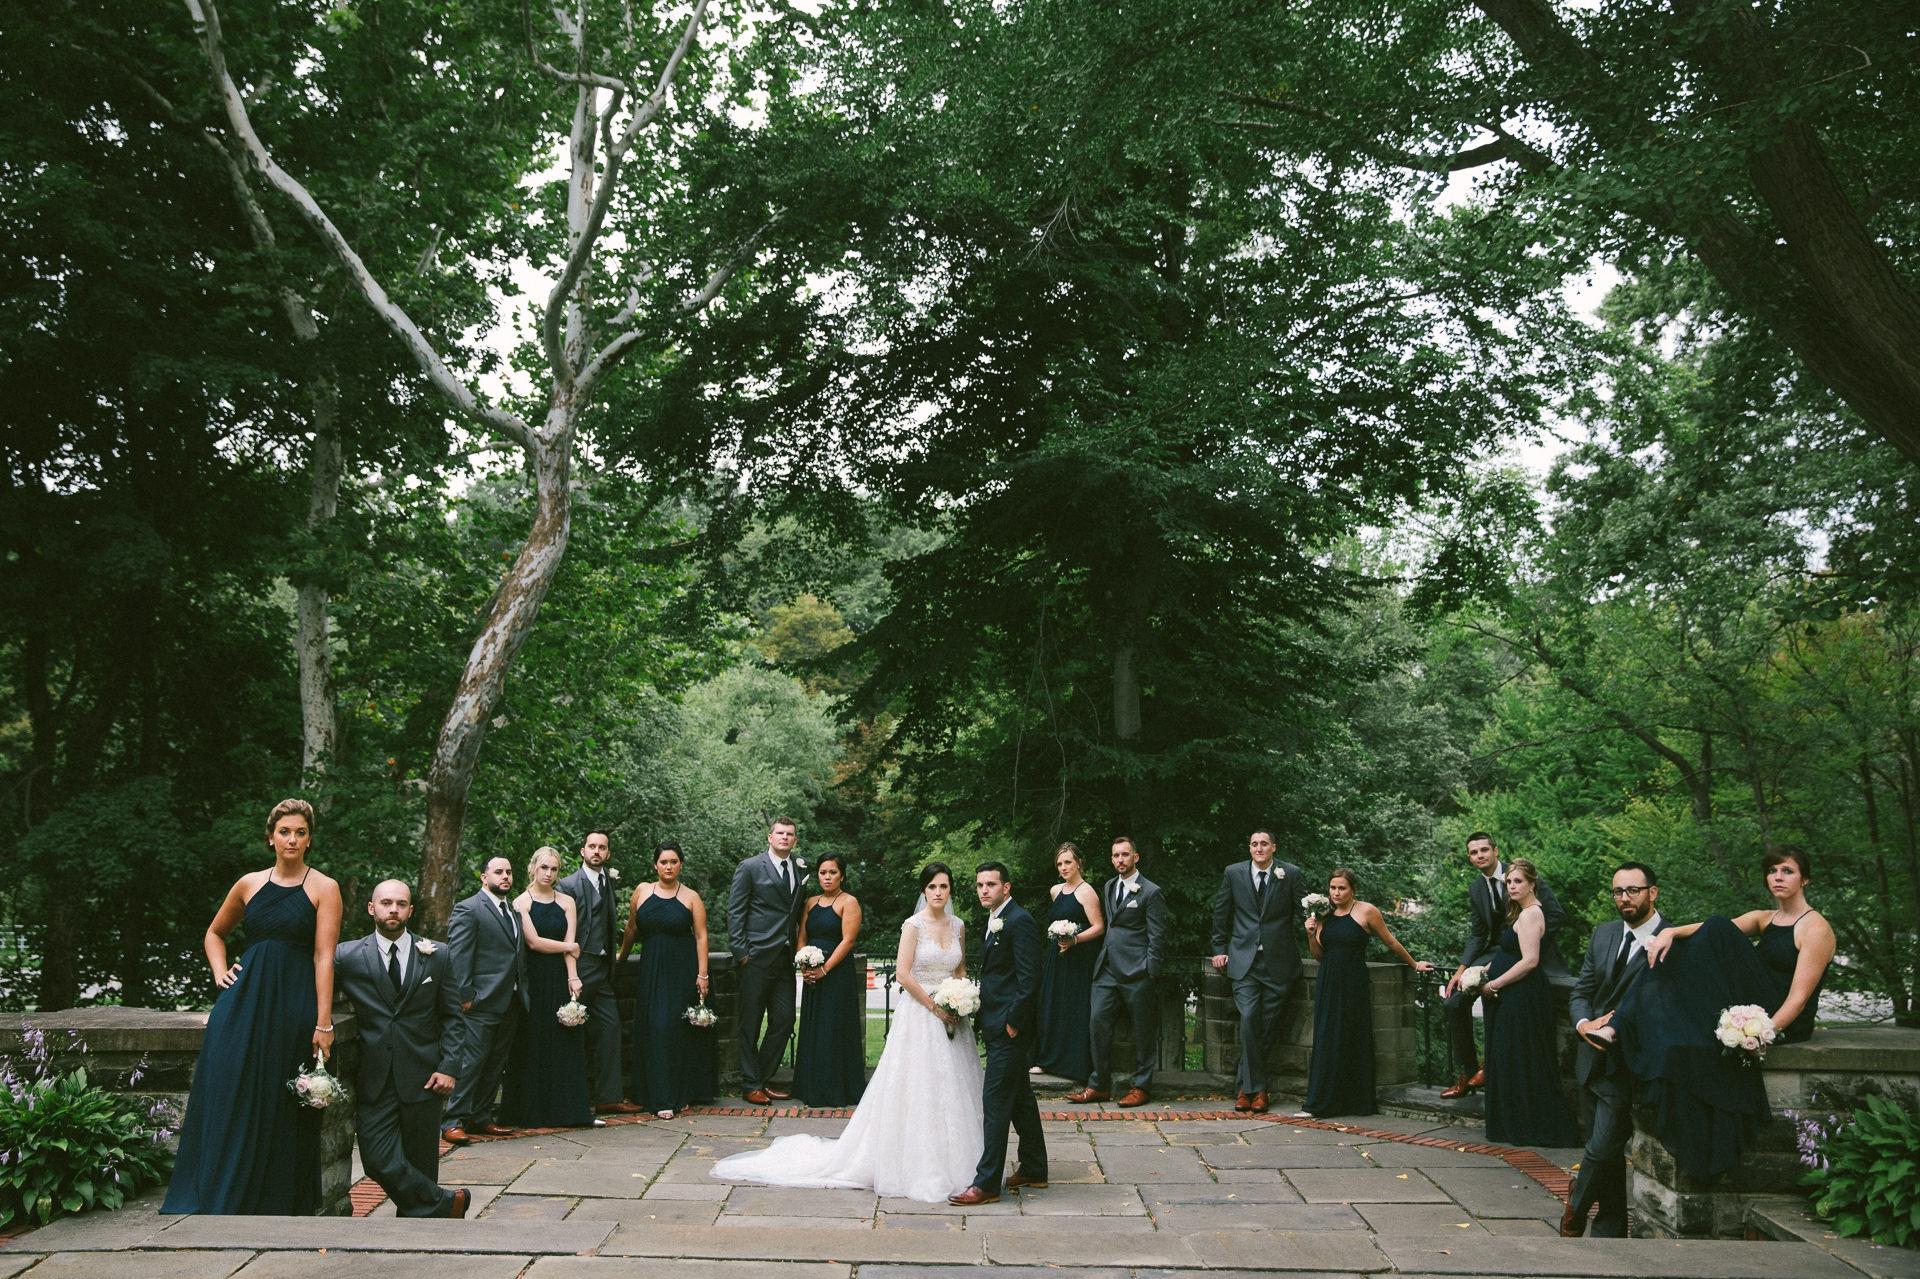 Intercontinental Hotel Wedding in Cleveland 2 16.jpg